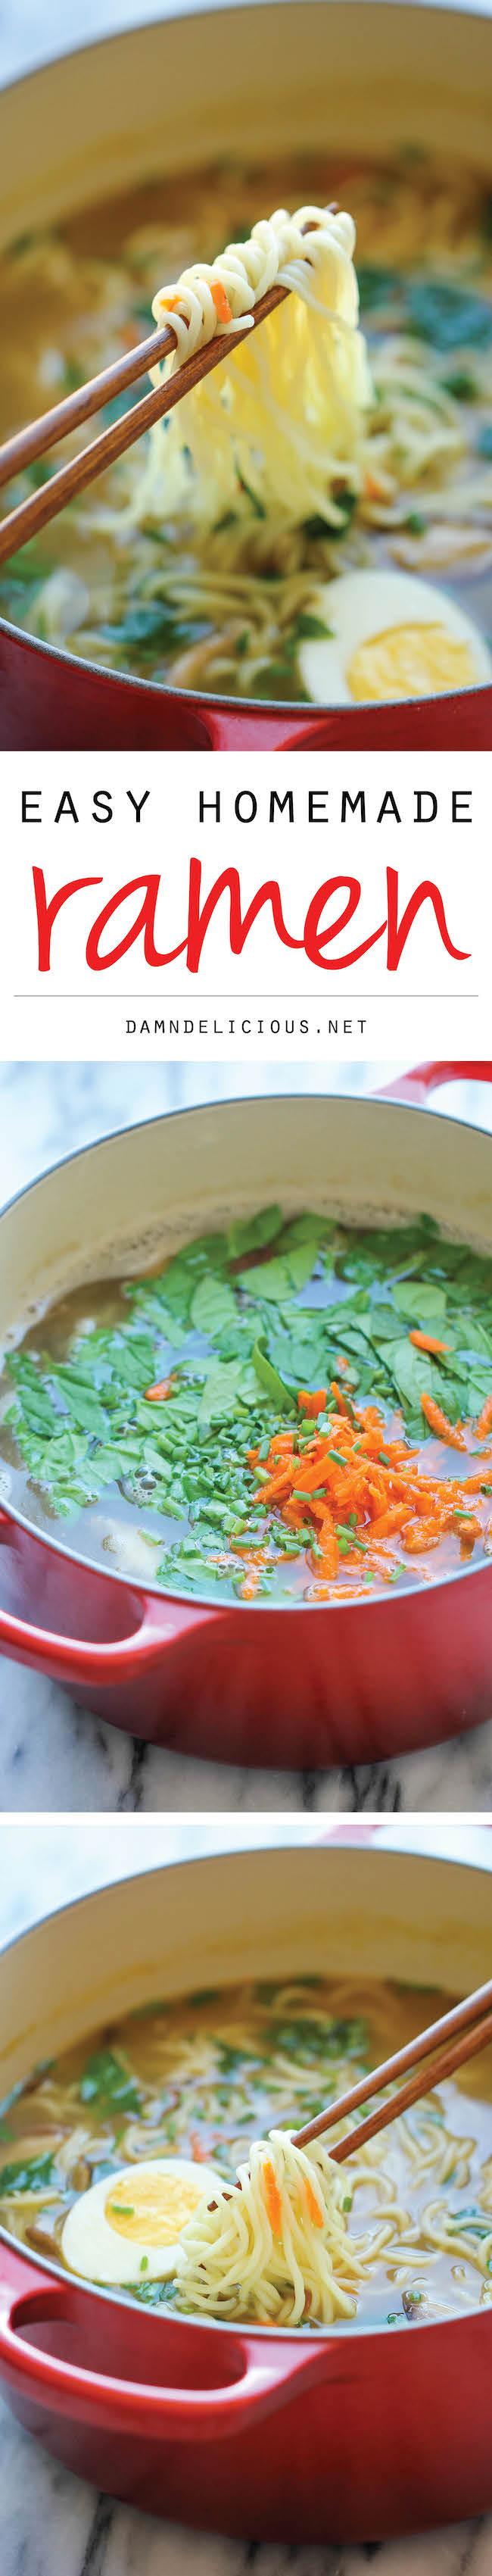 vegetarian ramen quick recipe you Easy easiest less ramen Homemade in Ramen The will ever   make